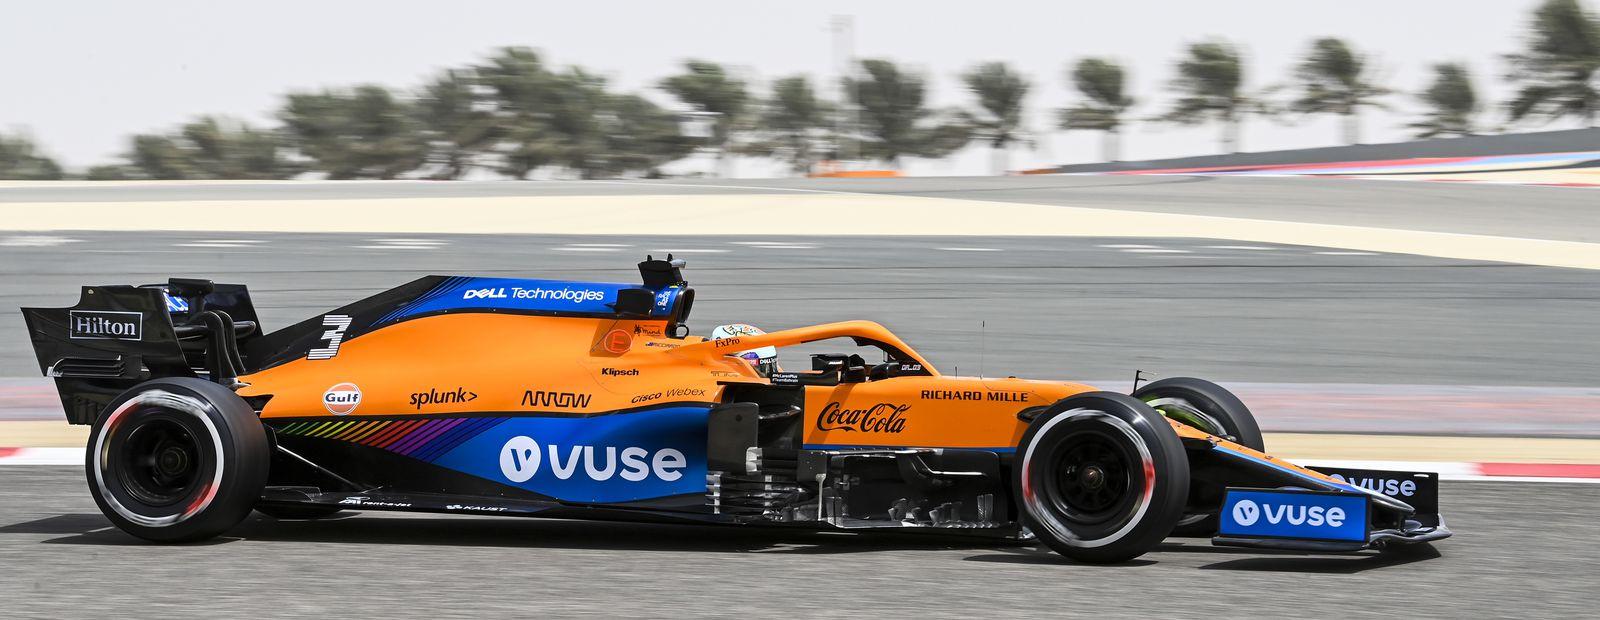 Bahrain test: Day 1